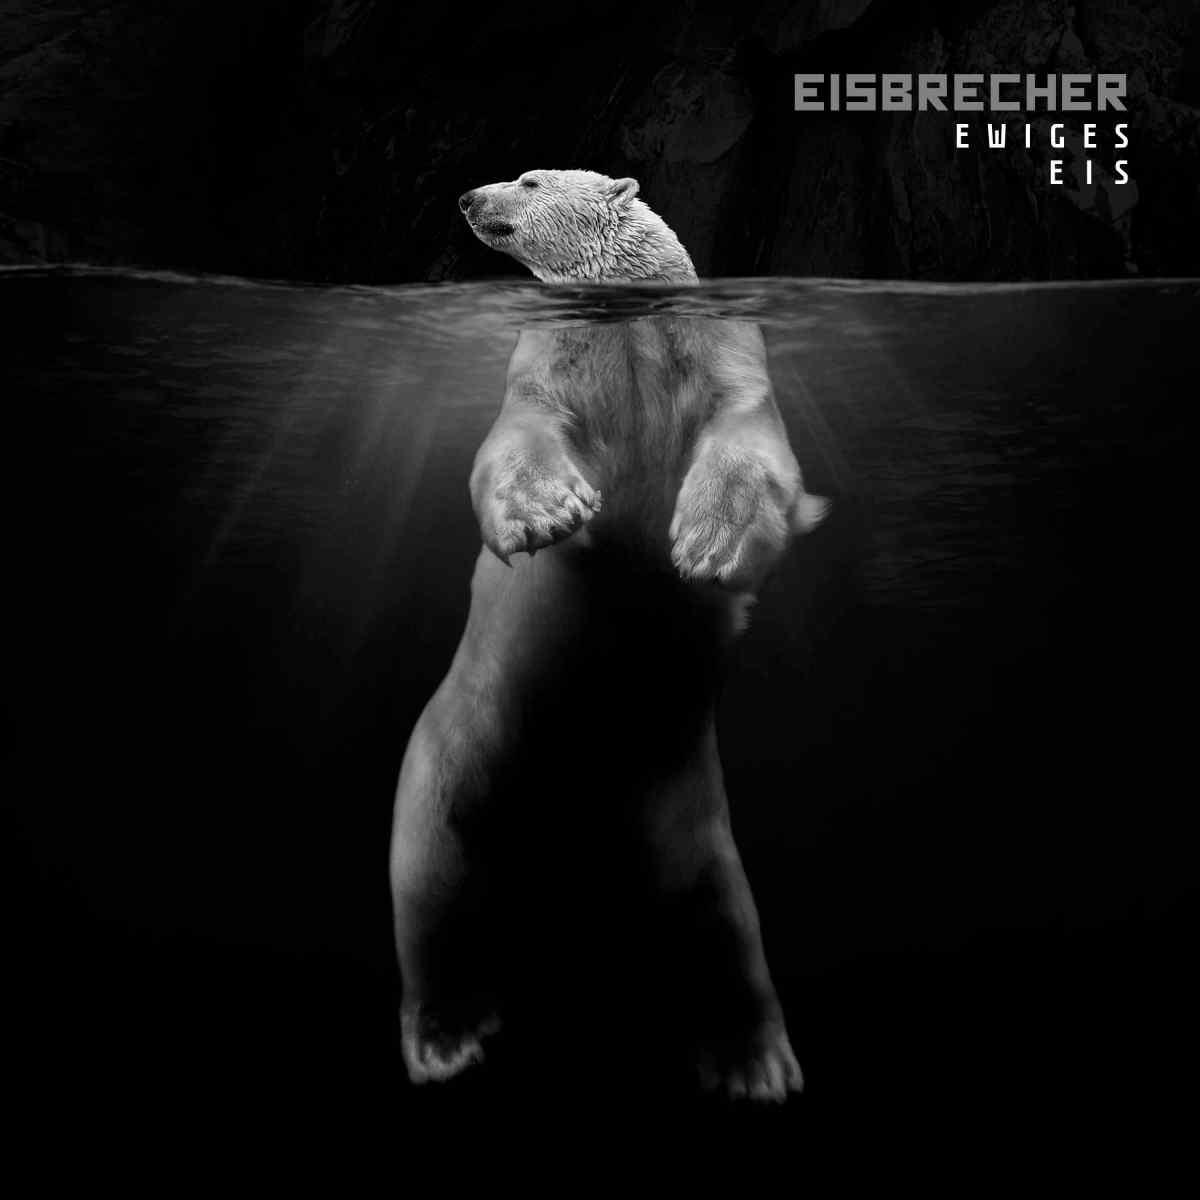 EISBRECHER will release 'Ewiges Eis - 15 Jahre Eisbrecher'